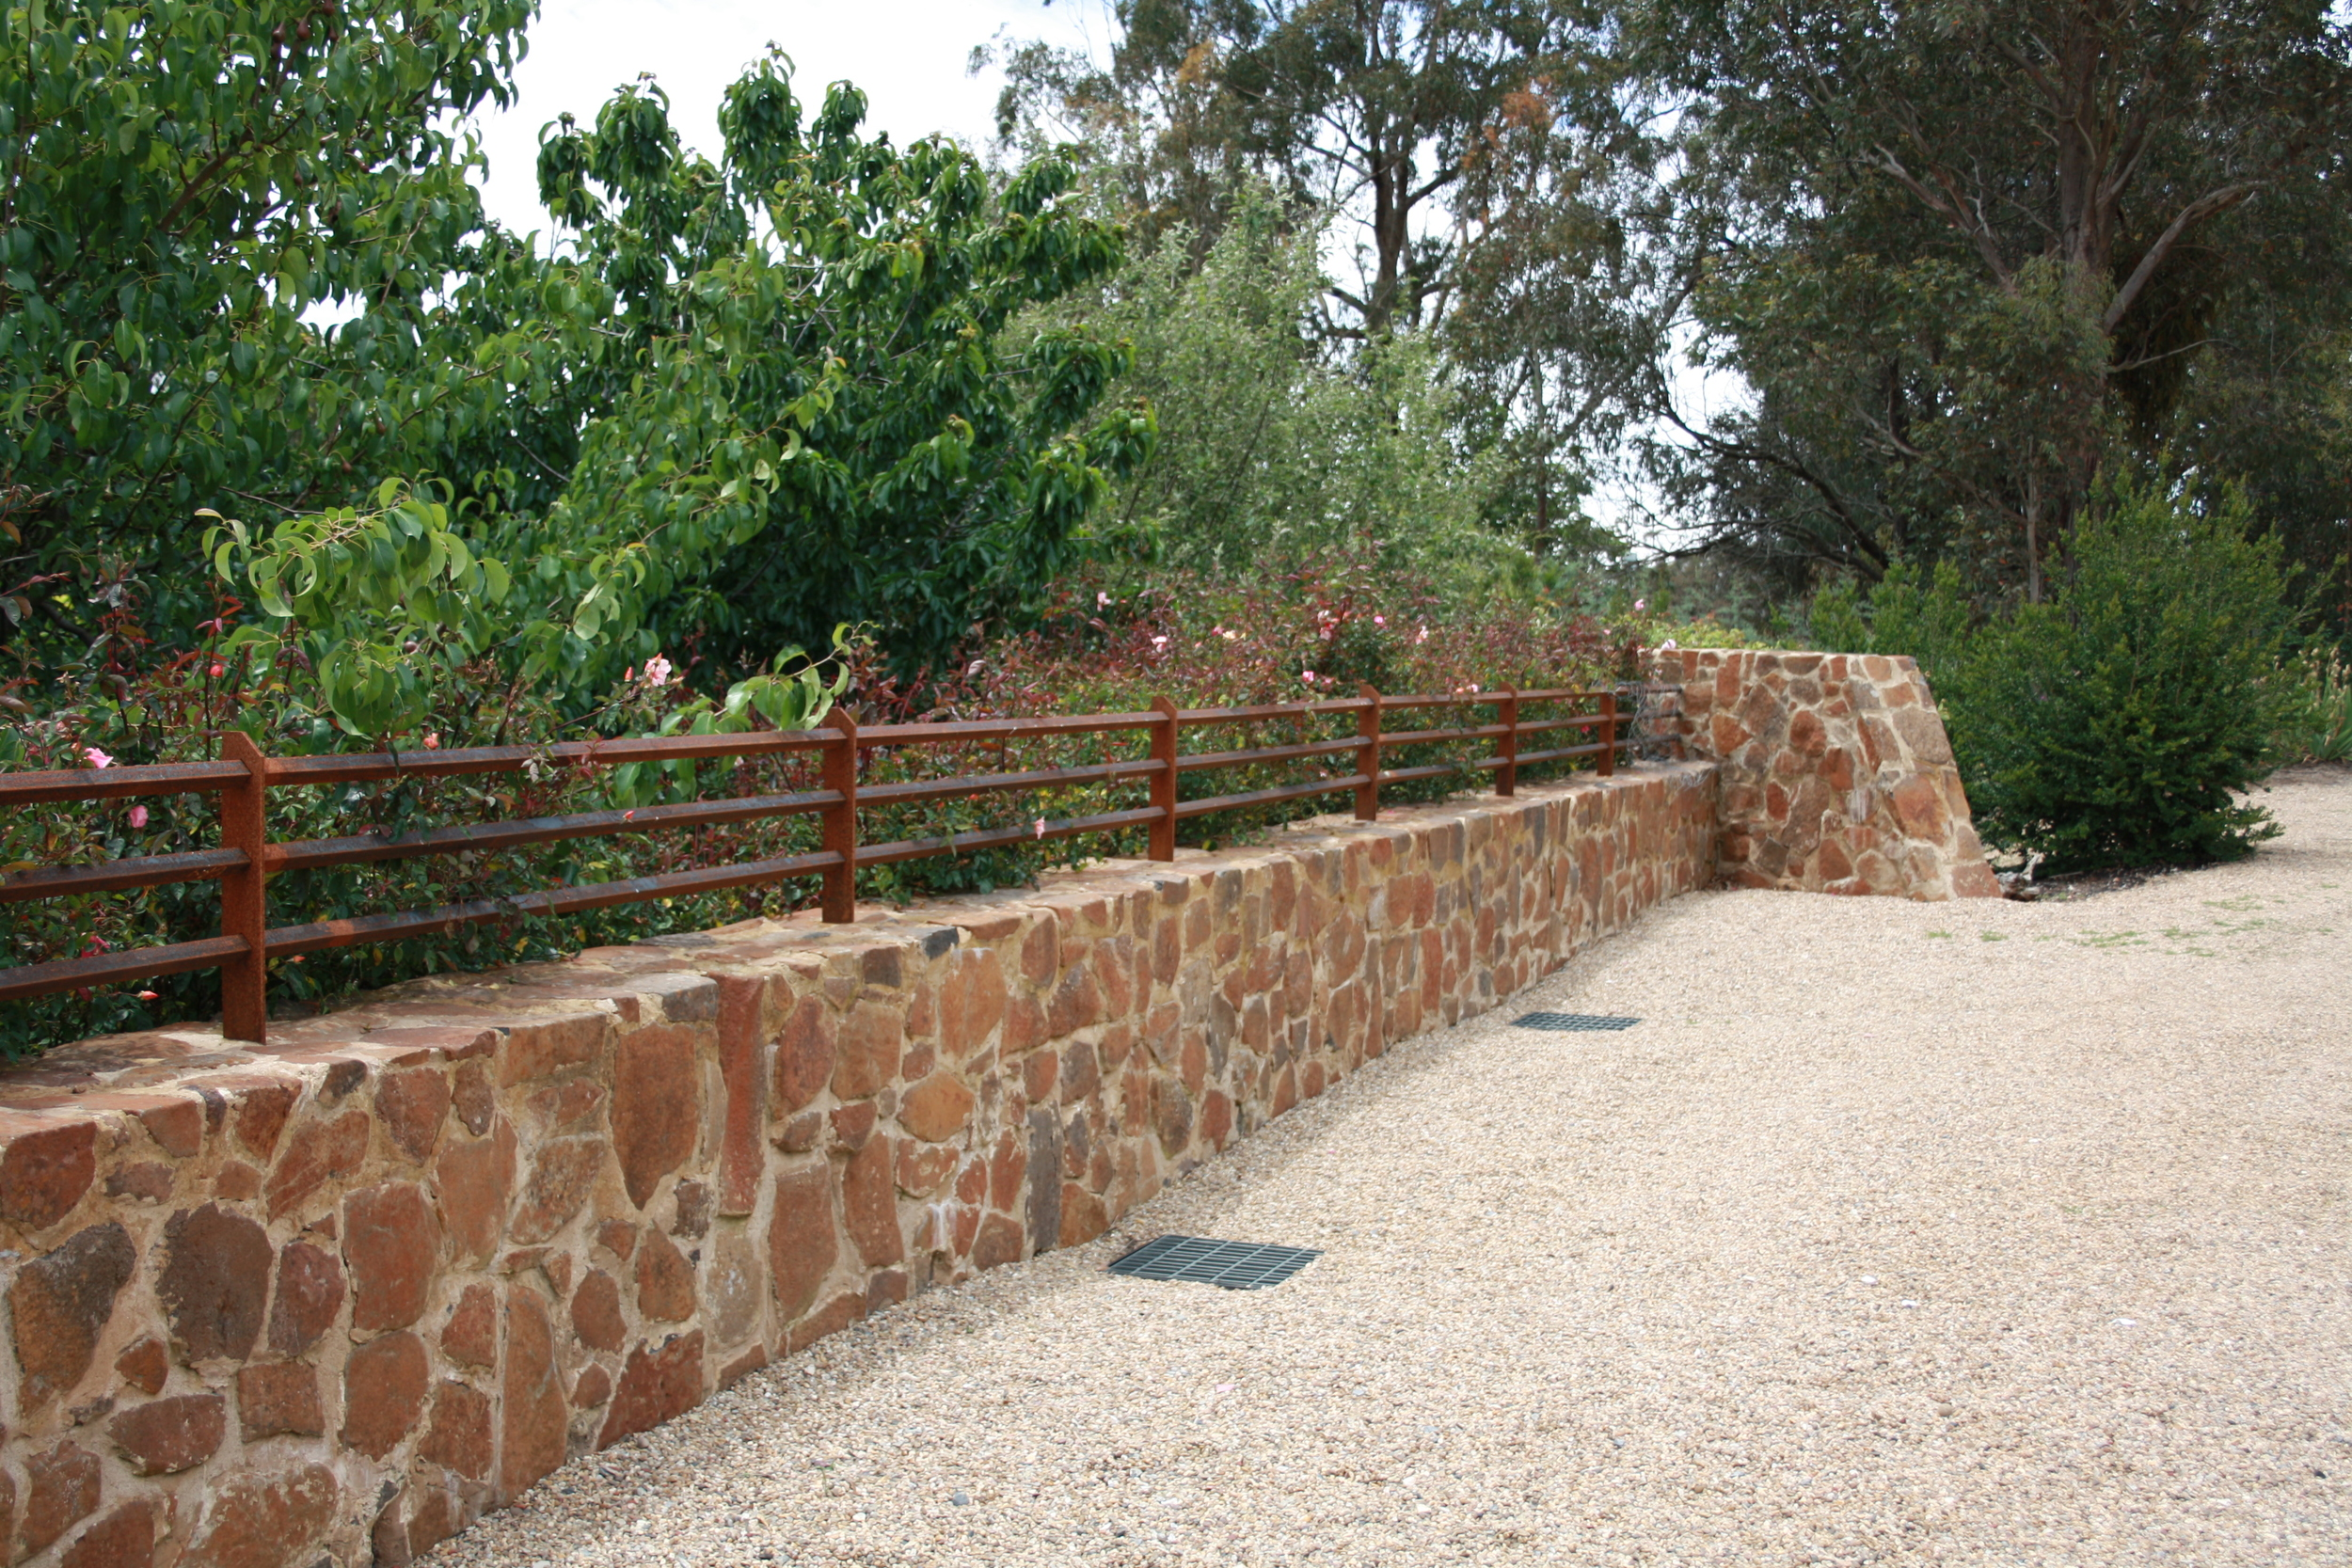 Andrew_Economos_Custom_Builder_Bowral_NSW_Australia_Earth_Home_11.JPG